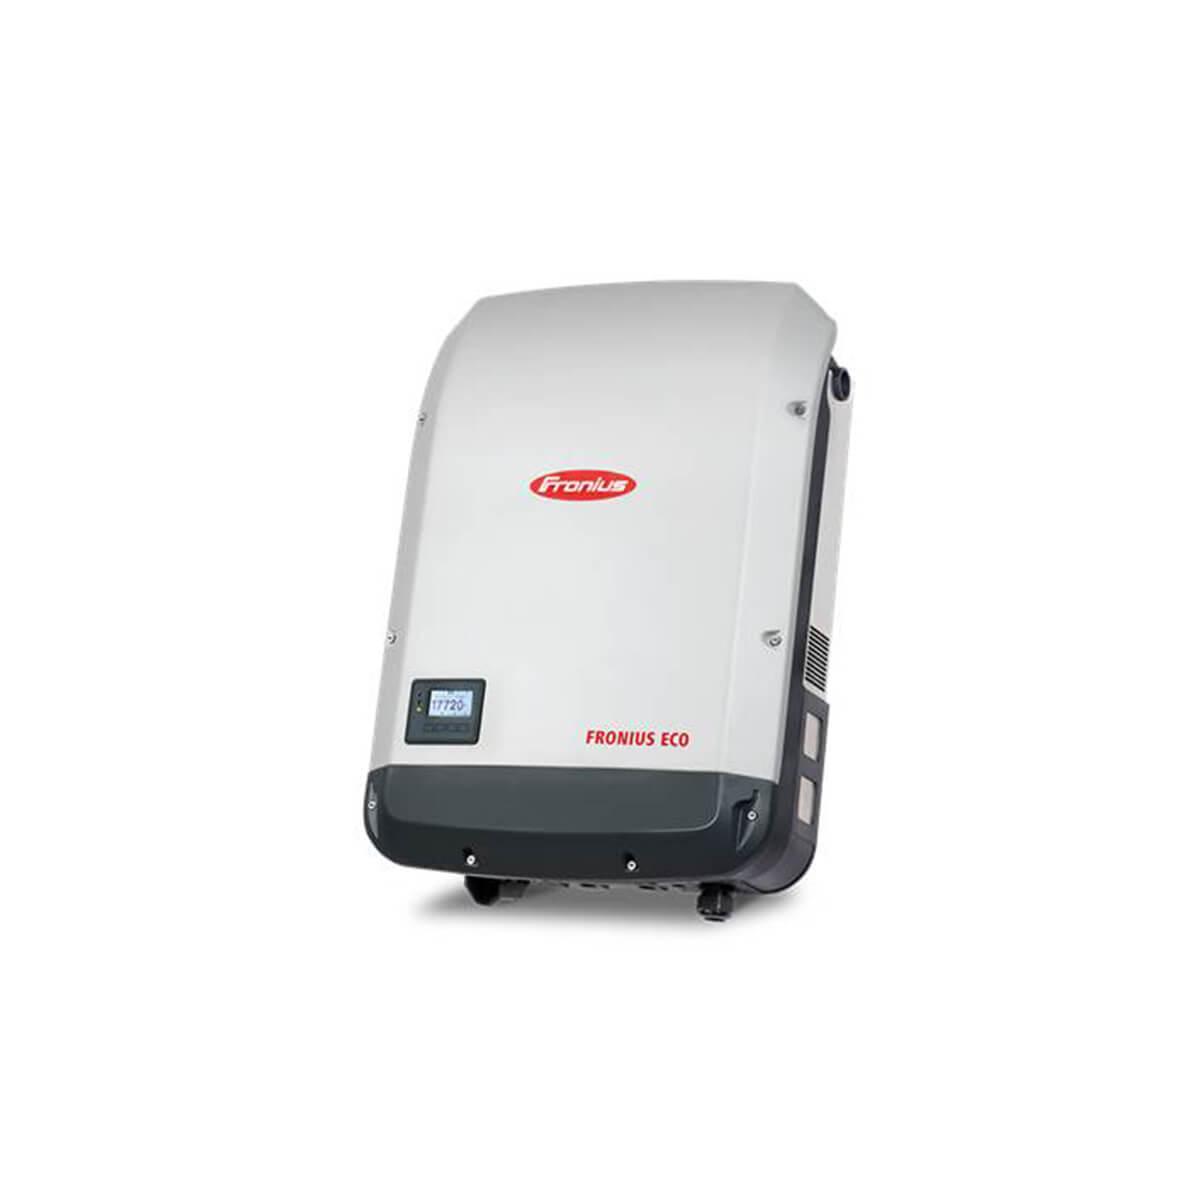 fronius 27kW inverter, fronius eco 27kW inverter, fronius eco 27.0-3-s inverter, fronius eco 27.0-3-s, fronius eco 27 kW